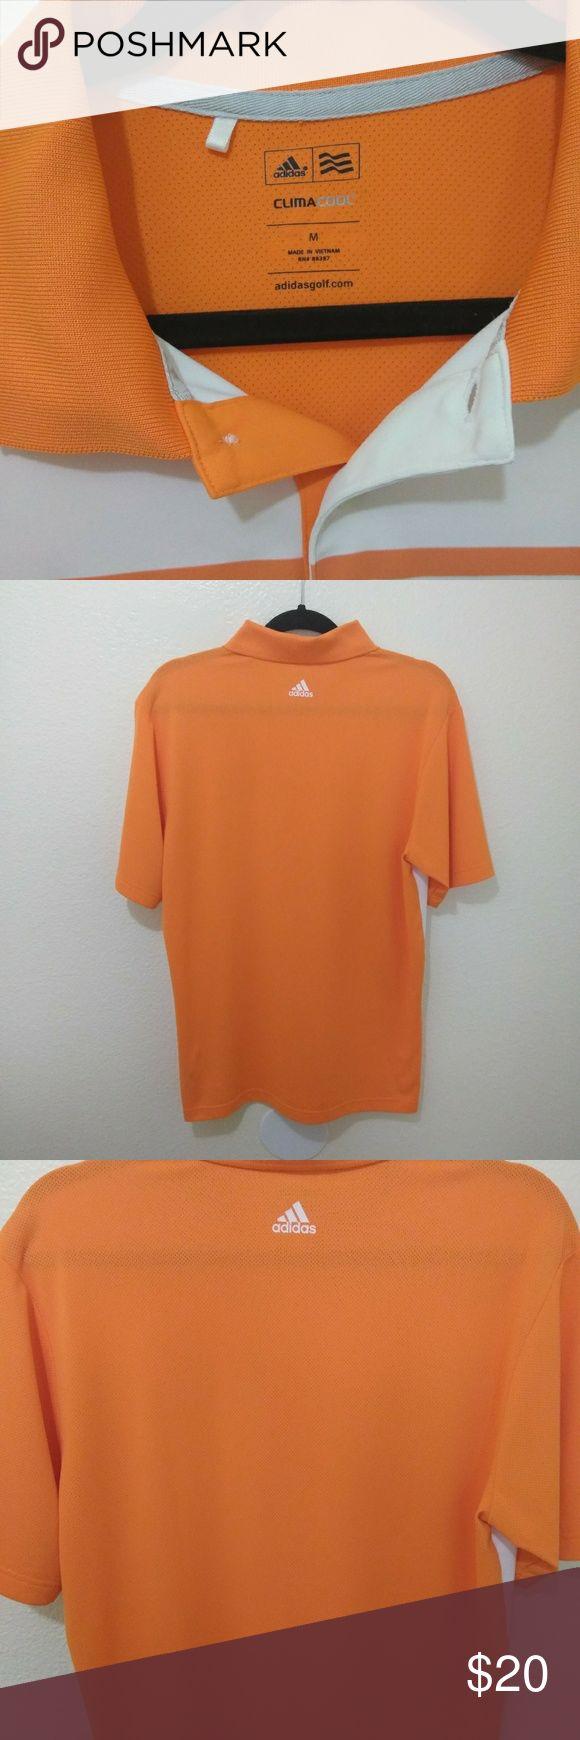 Addidas Athletic Golf Polo Shirt Addidas Climacool Three Stripe Athletic Golf Polo Orange,White Short Sleeve Shirt...in E.U.C Addidas Shirts Polos